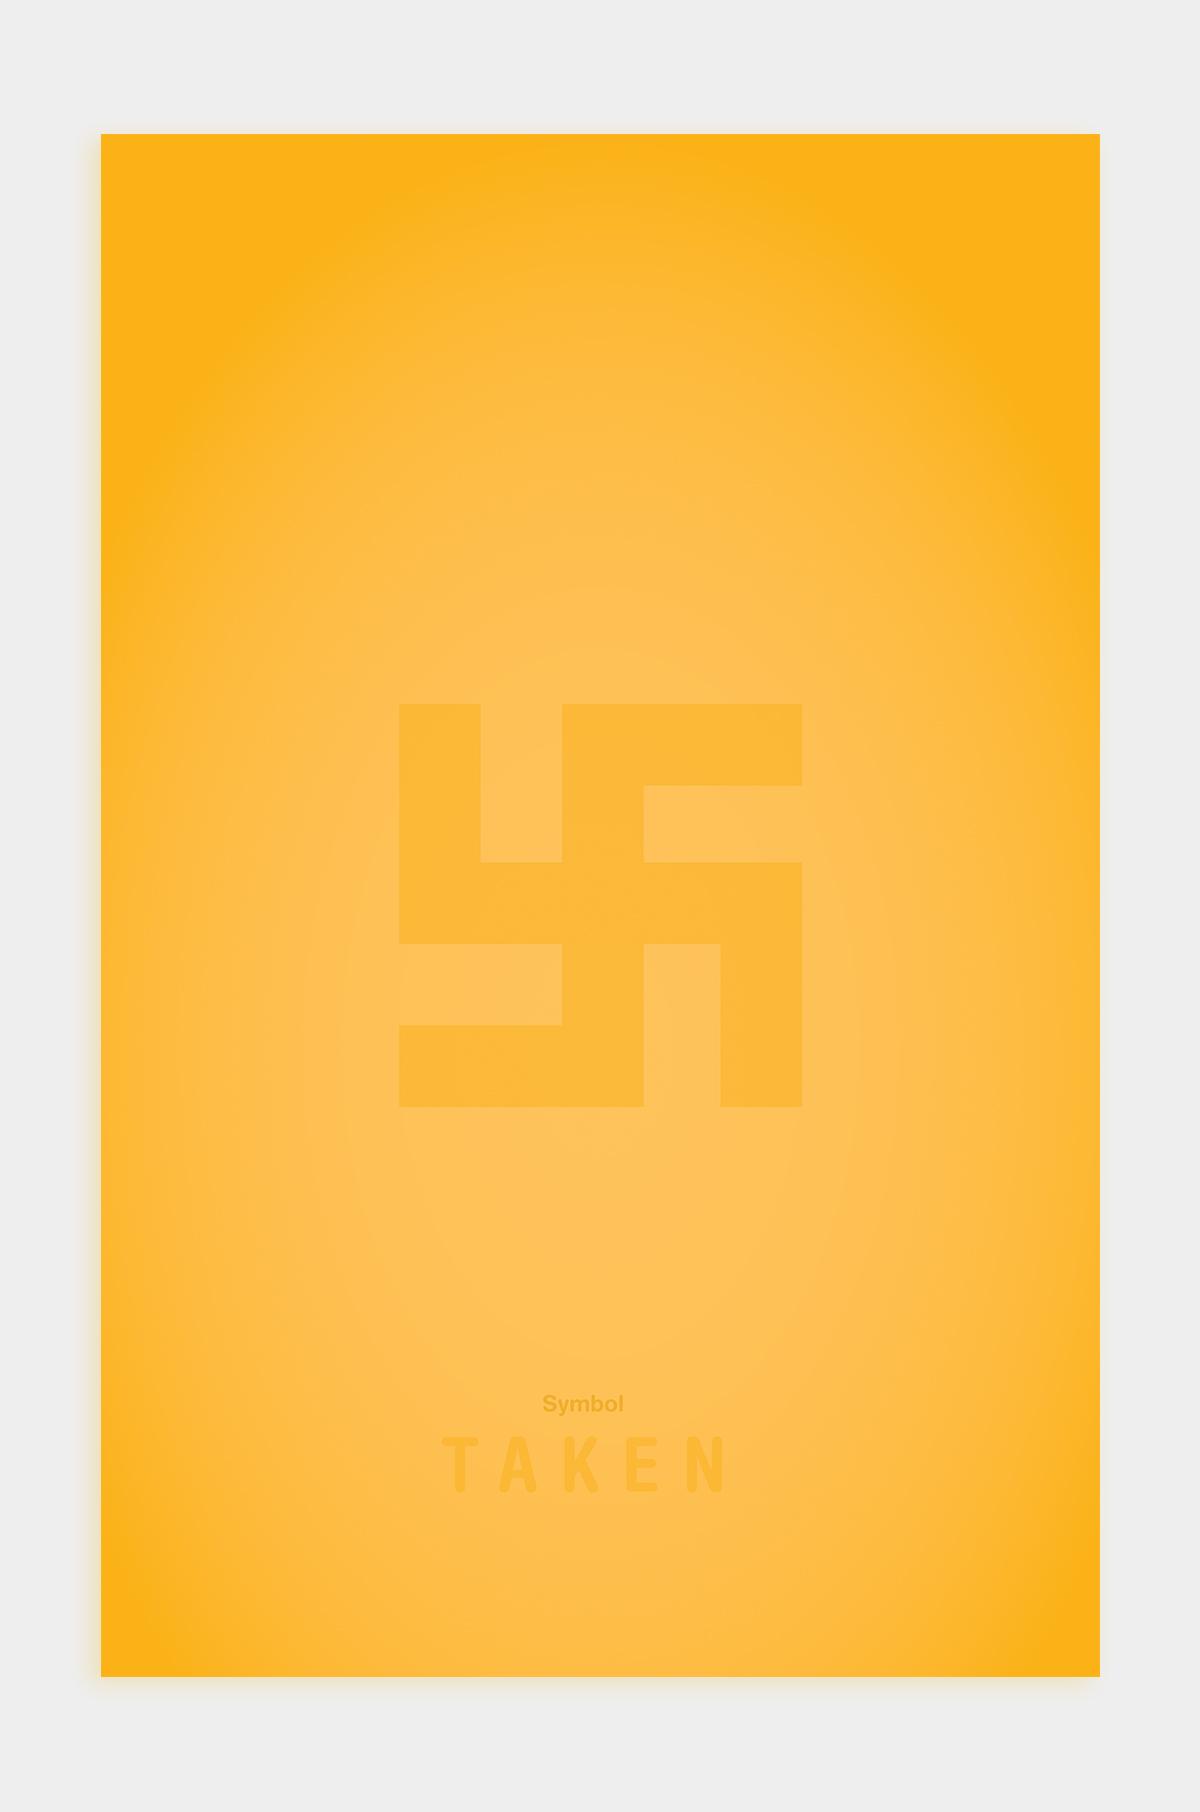 symbolism-poster-series-display-image-closeup-1